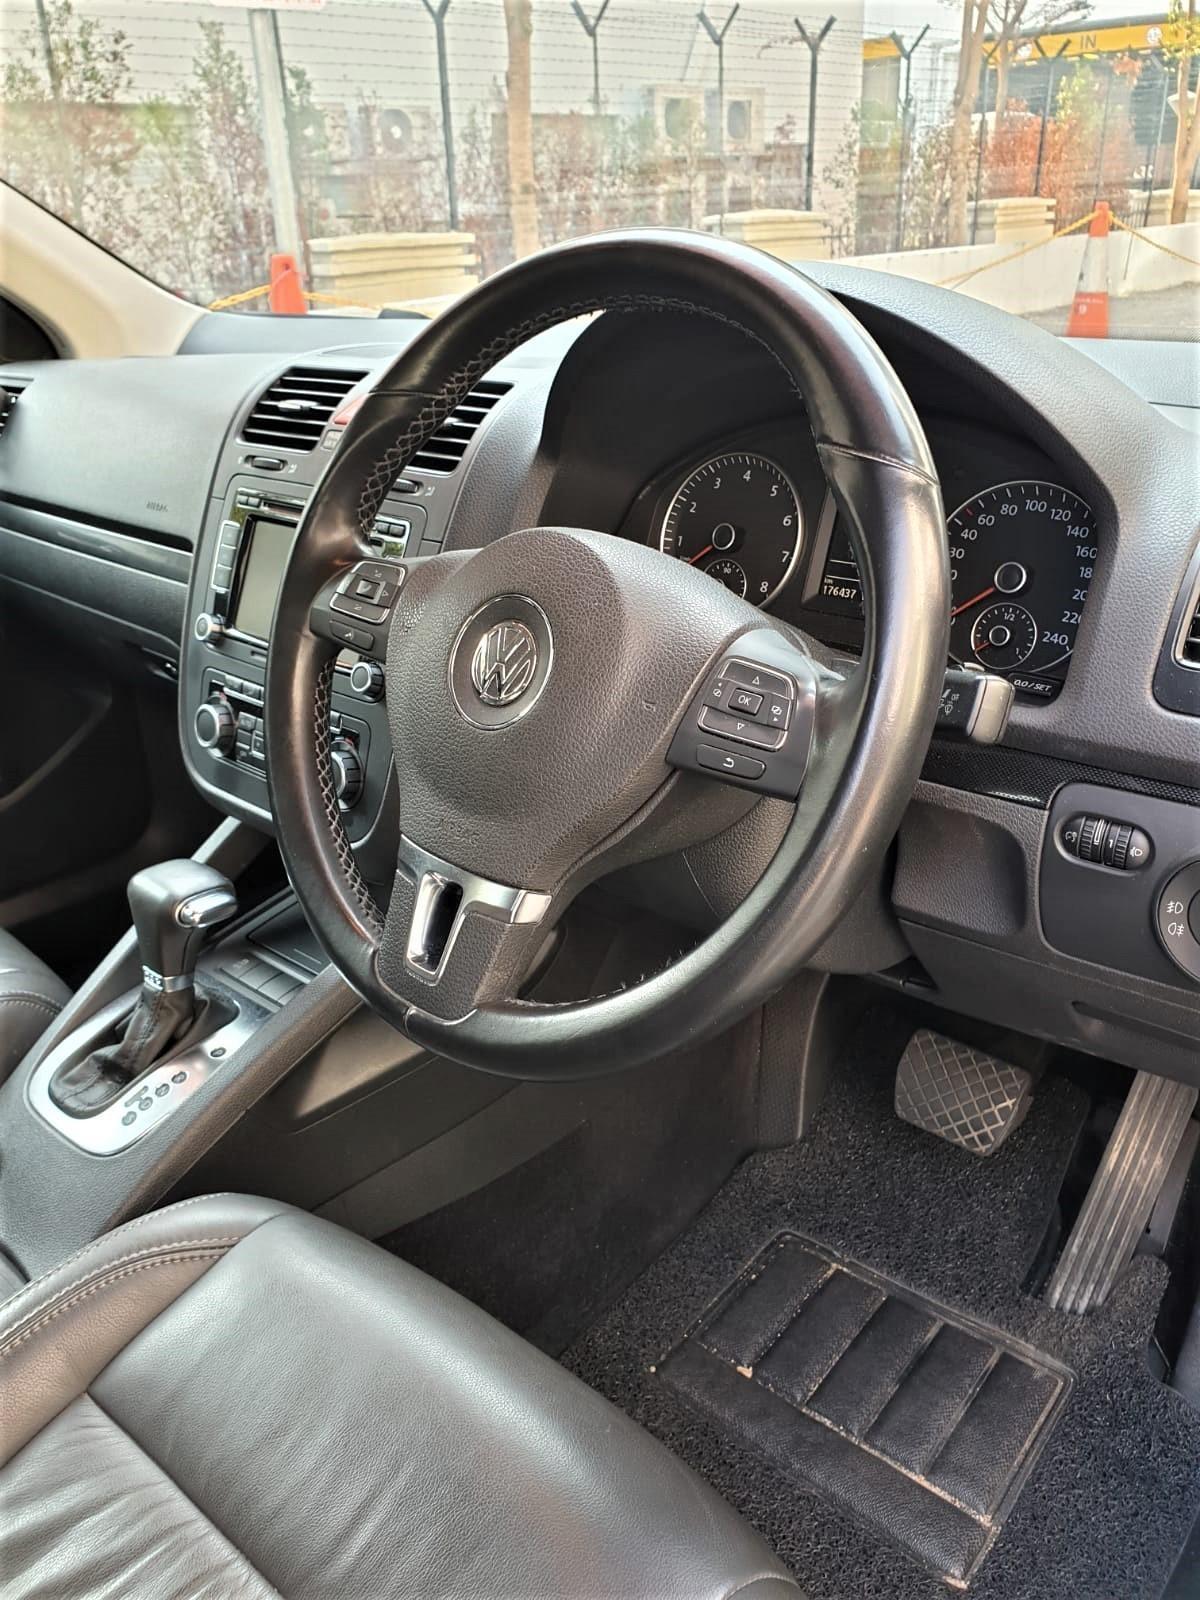 Volkswagen Jetta TSI 1.4- Best rates, full servicing provided!